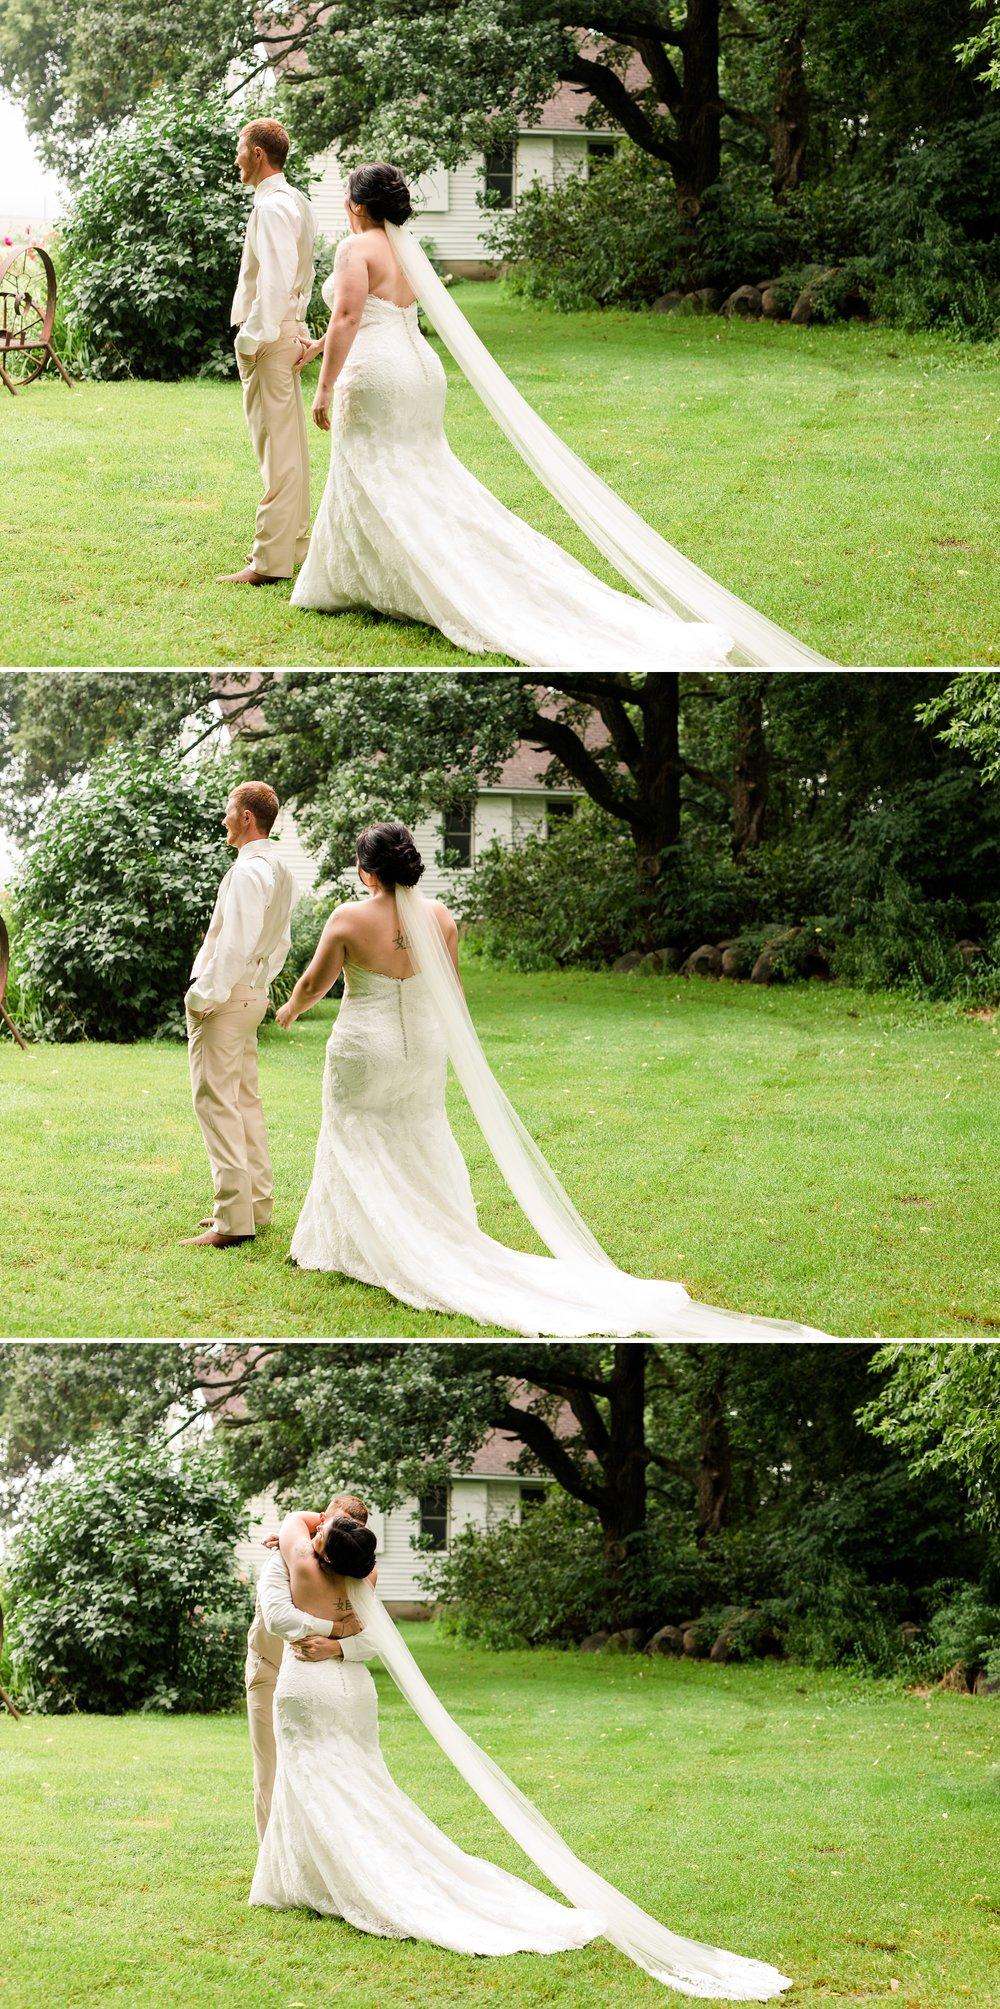 Minnesota Barn Wedding and Outdoor Ceremony at Milts Barn_0280.jpg